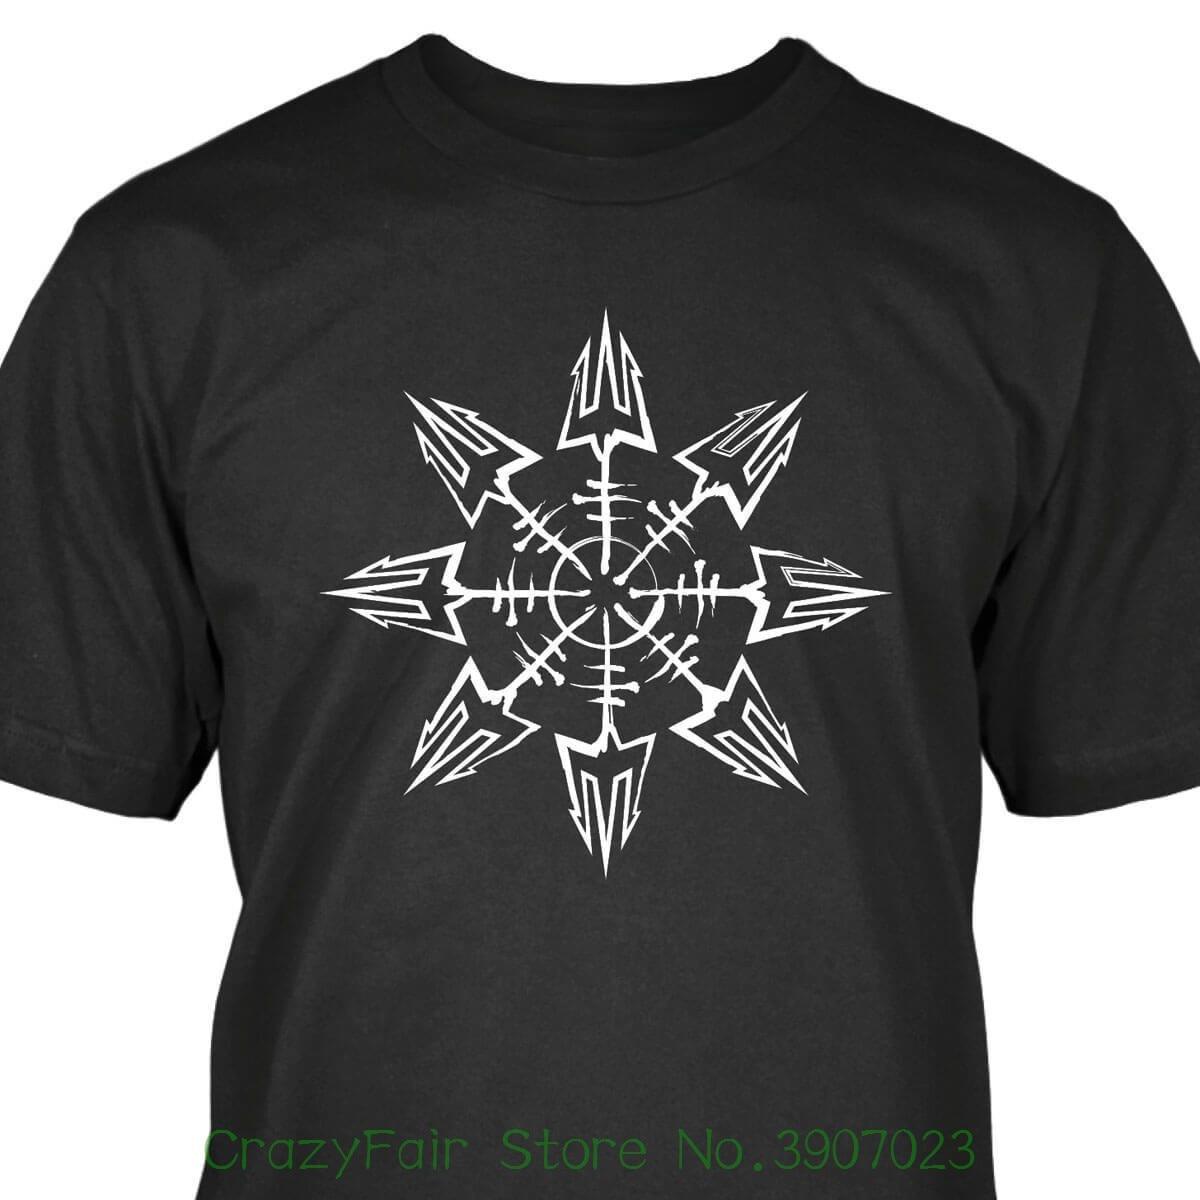 Fafnir - Helm Des Schreckens T-shirt Tshirt O-neck Summer Personality Fashion Men T-shirts